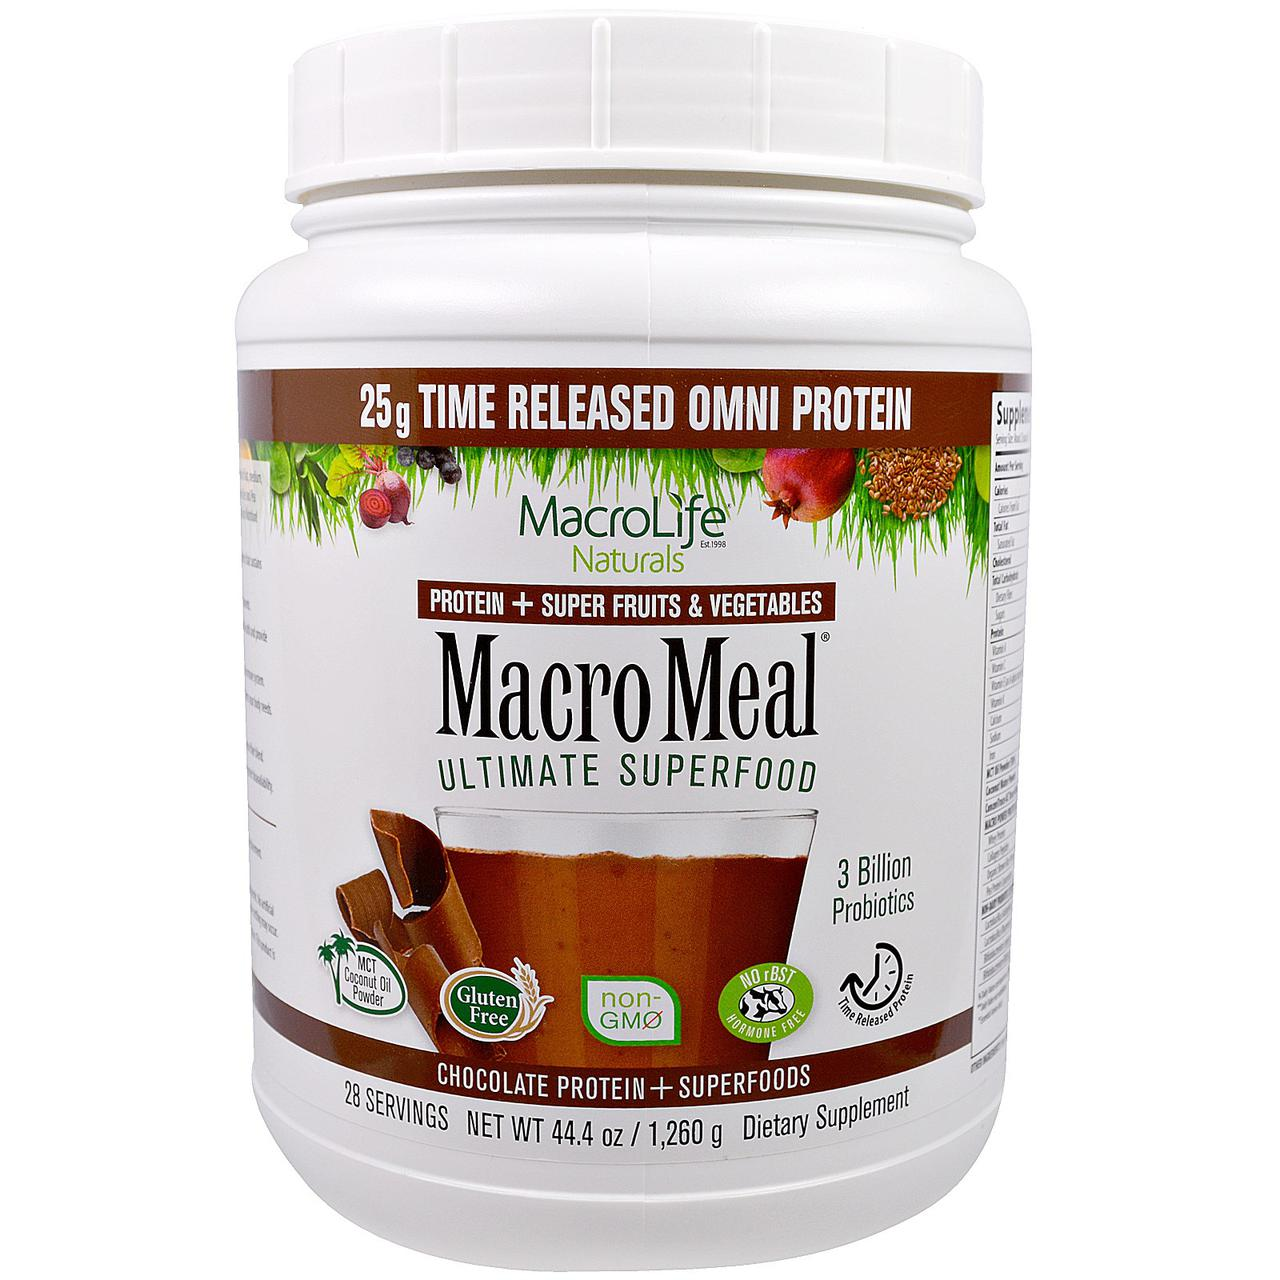 Macrolife Naturals, MacroMeal, Шоколадный протеин + супер питание, 44.4 унции(1,260 г)